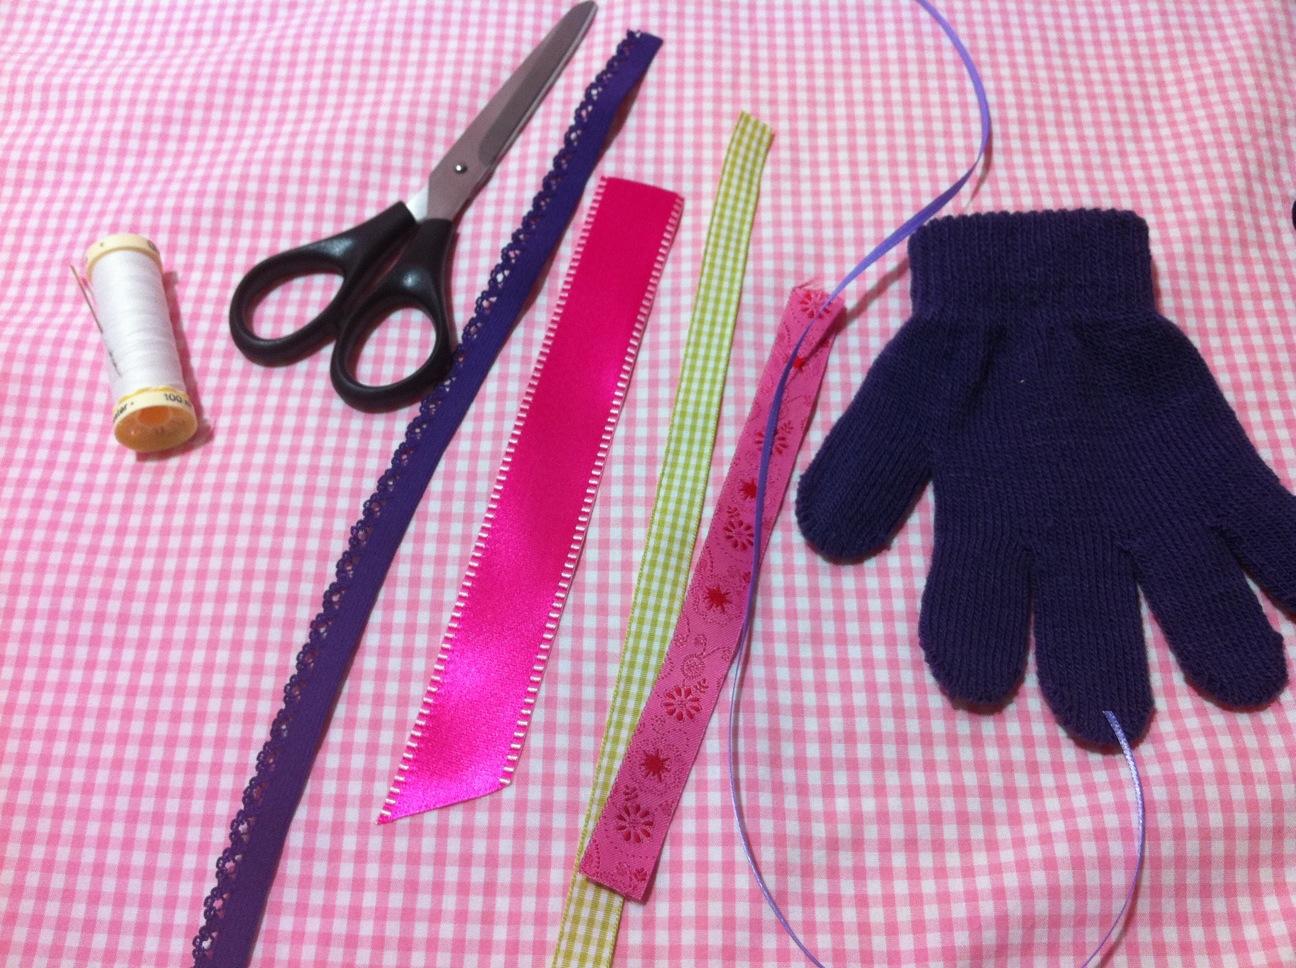 babyspielzeug selber machen pekip spielzeug pech schwefel. Black Bedroom Furniture Sets. Home Design Ideas